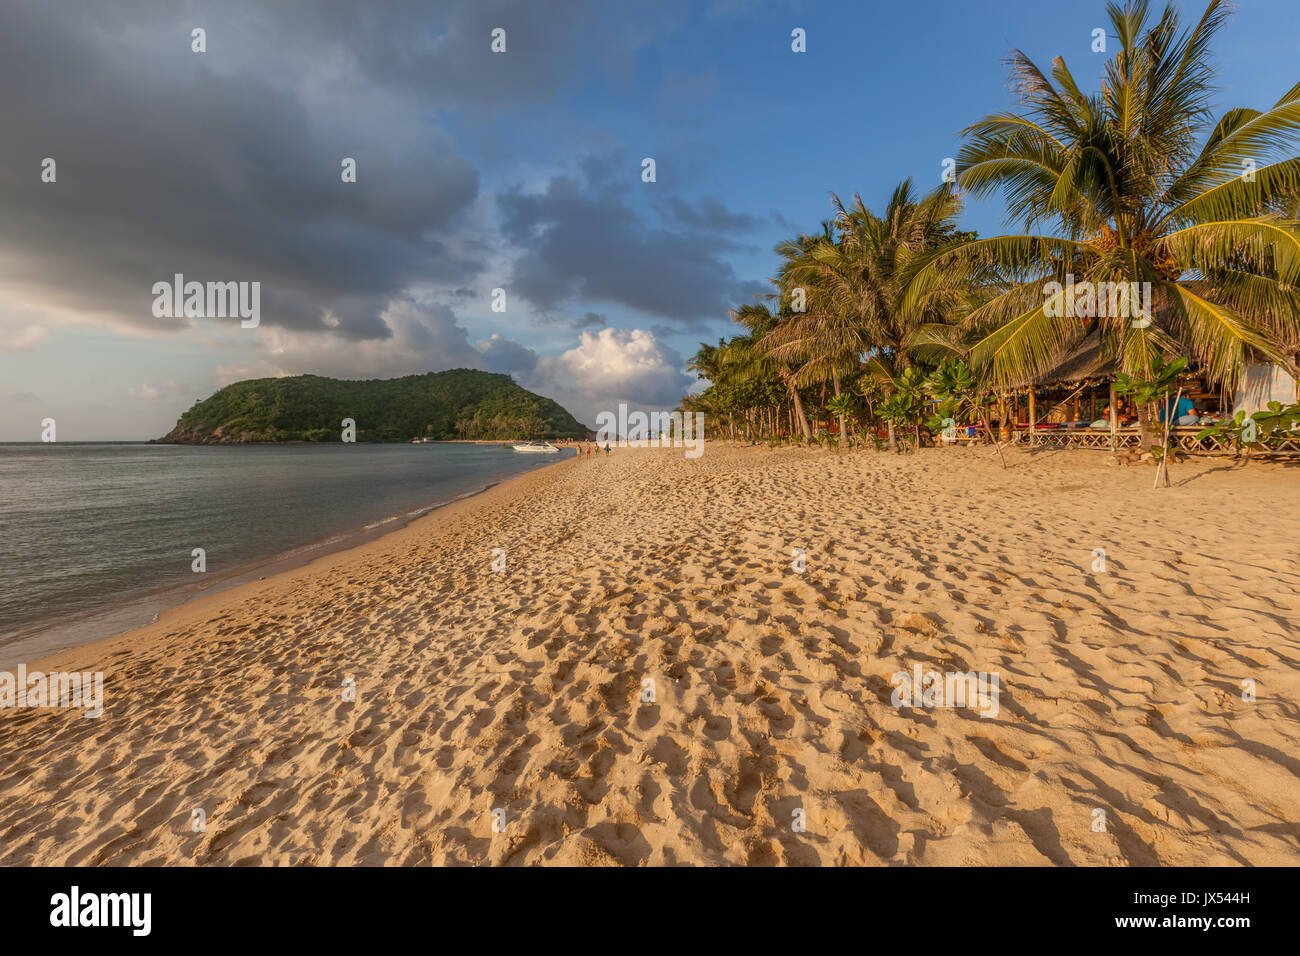 Mae Haad Beach at sunset, Koh Phangan island, Thailand - Stock Image